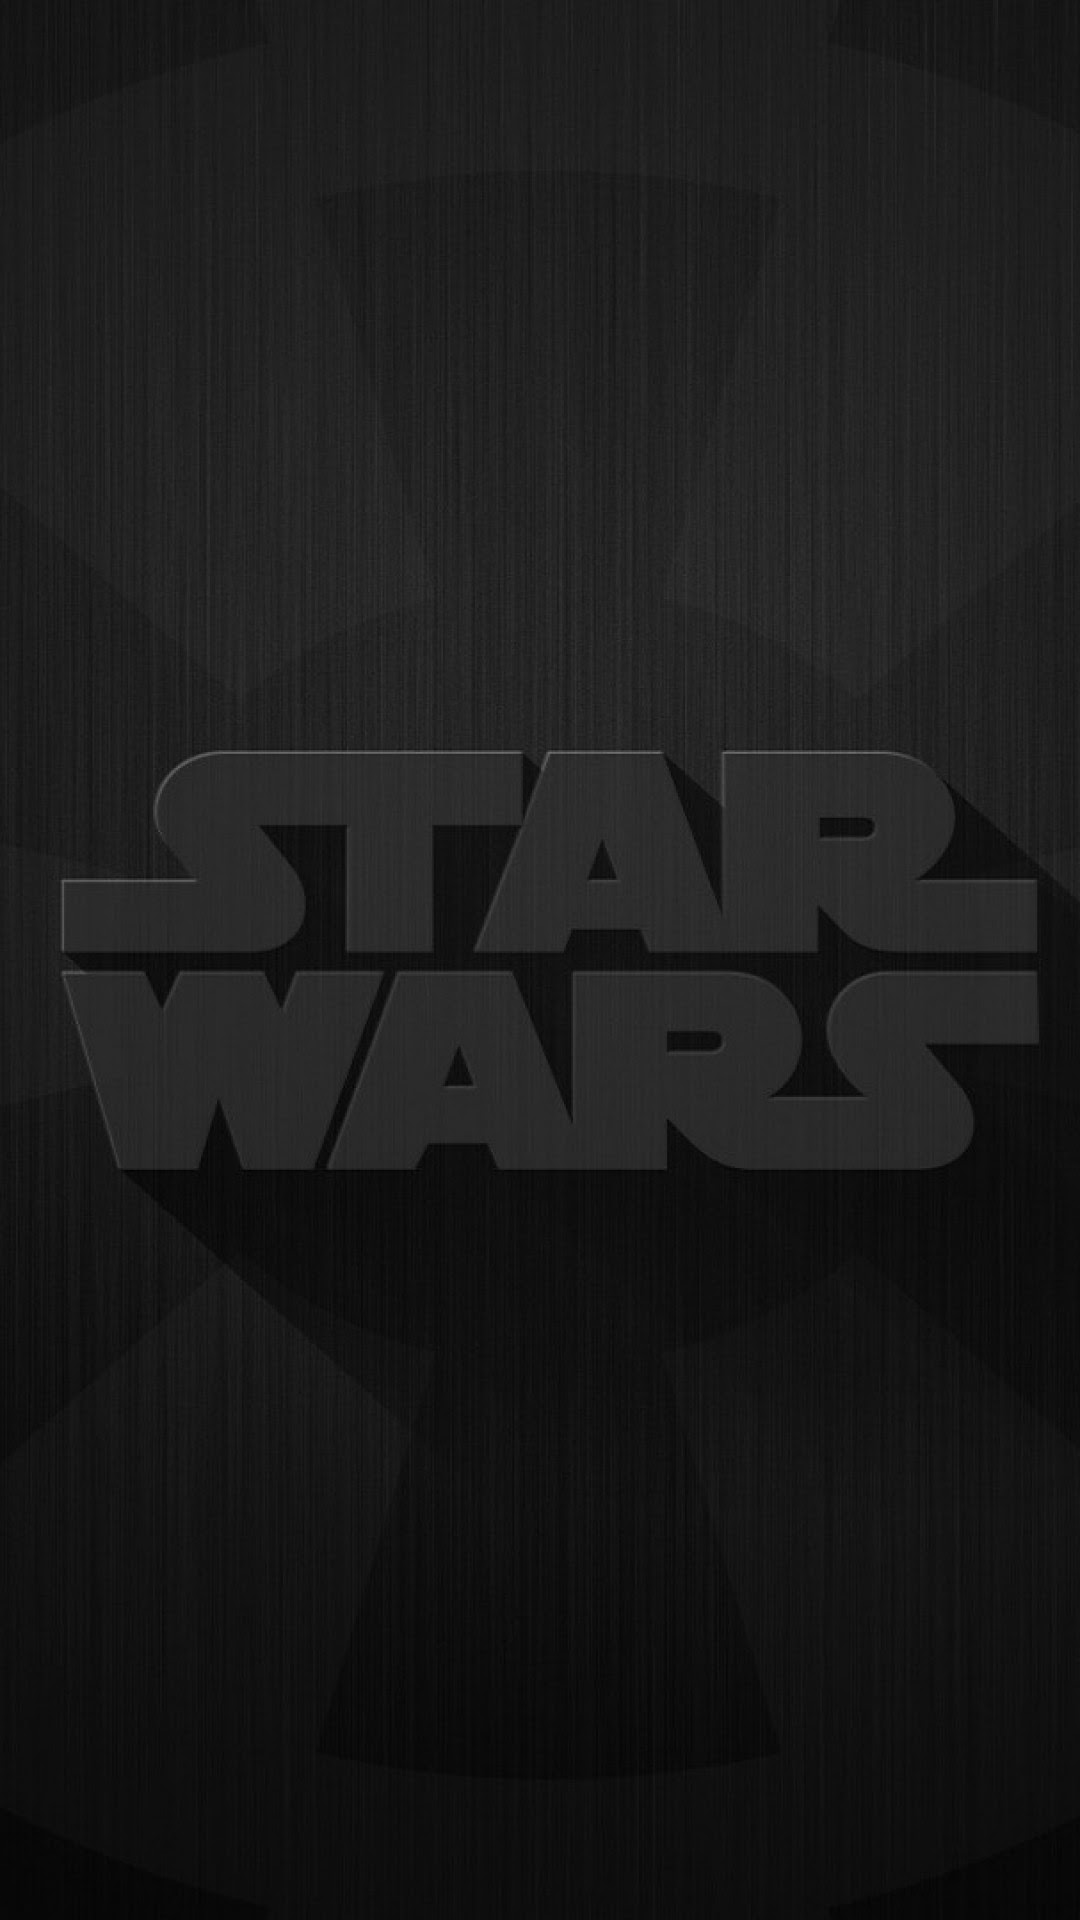 Star Wars Wallpaper Black